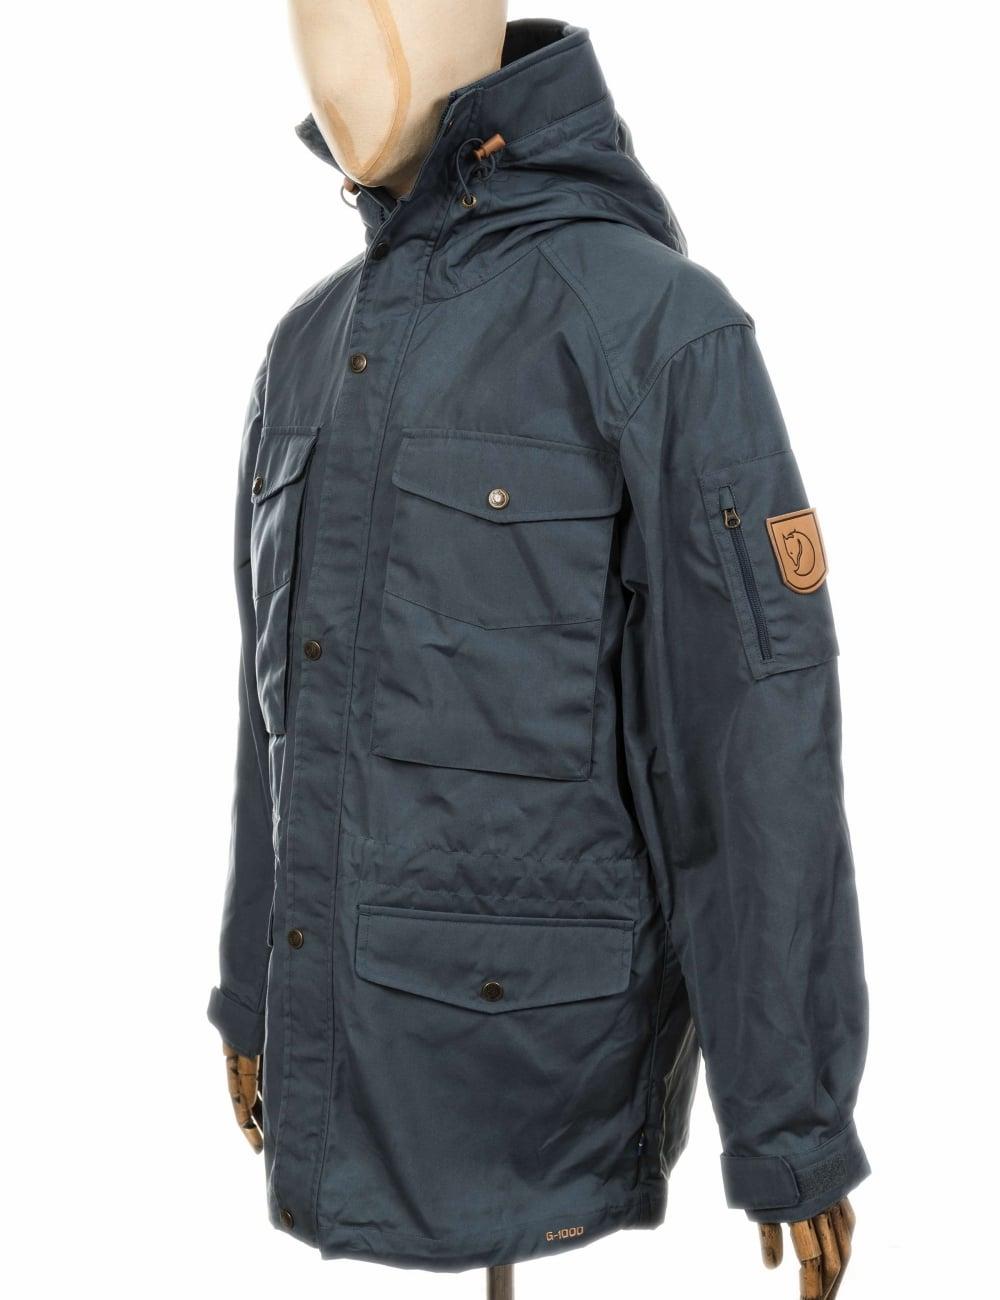 2d808c2d1e1 Fjallraven Singi Trekking Jacket - Dusk - Clothing from Fat Buddha ...